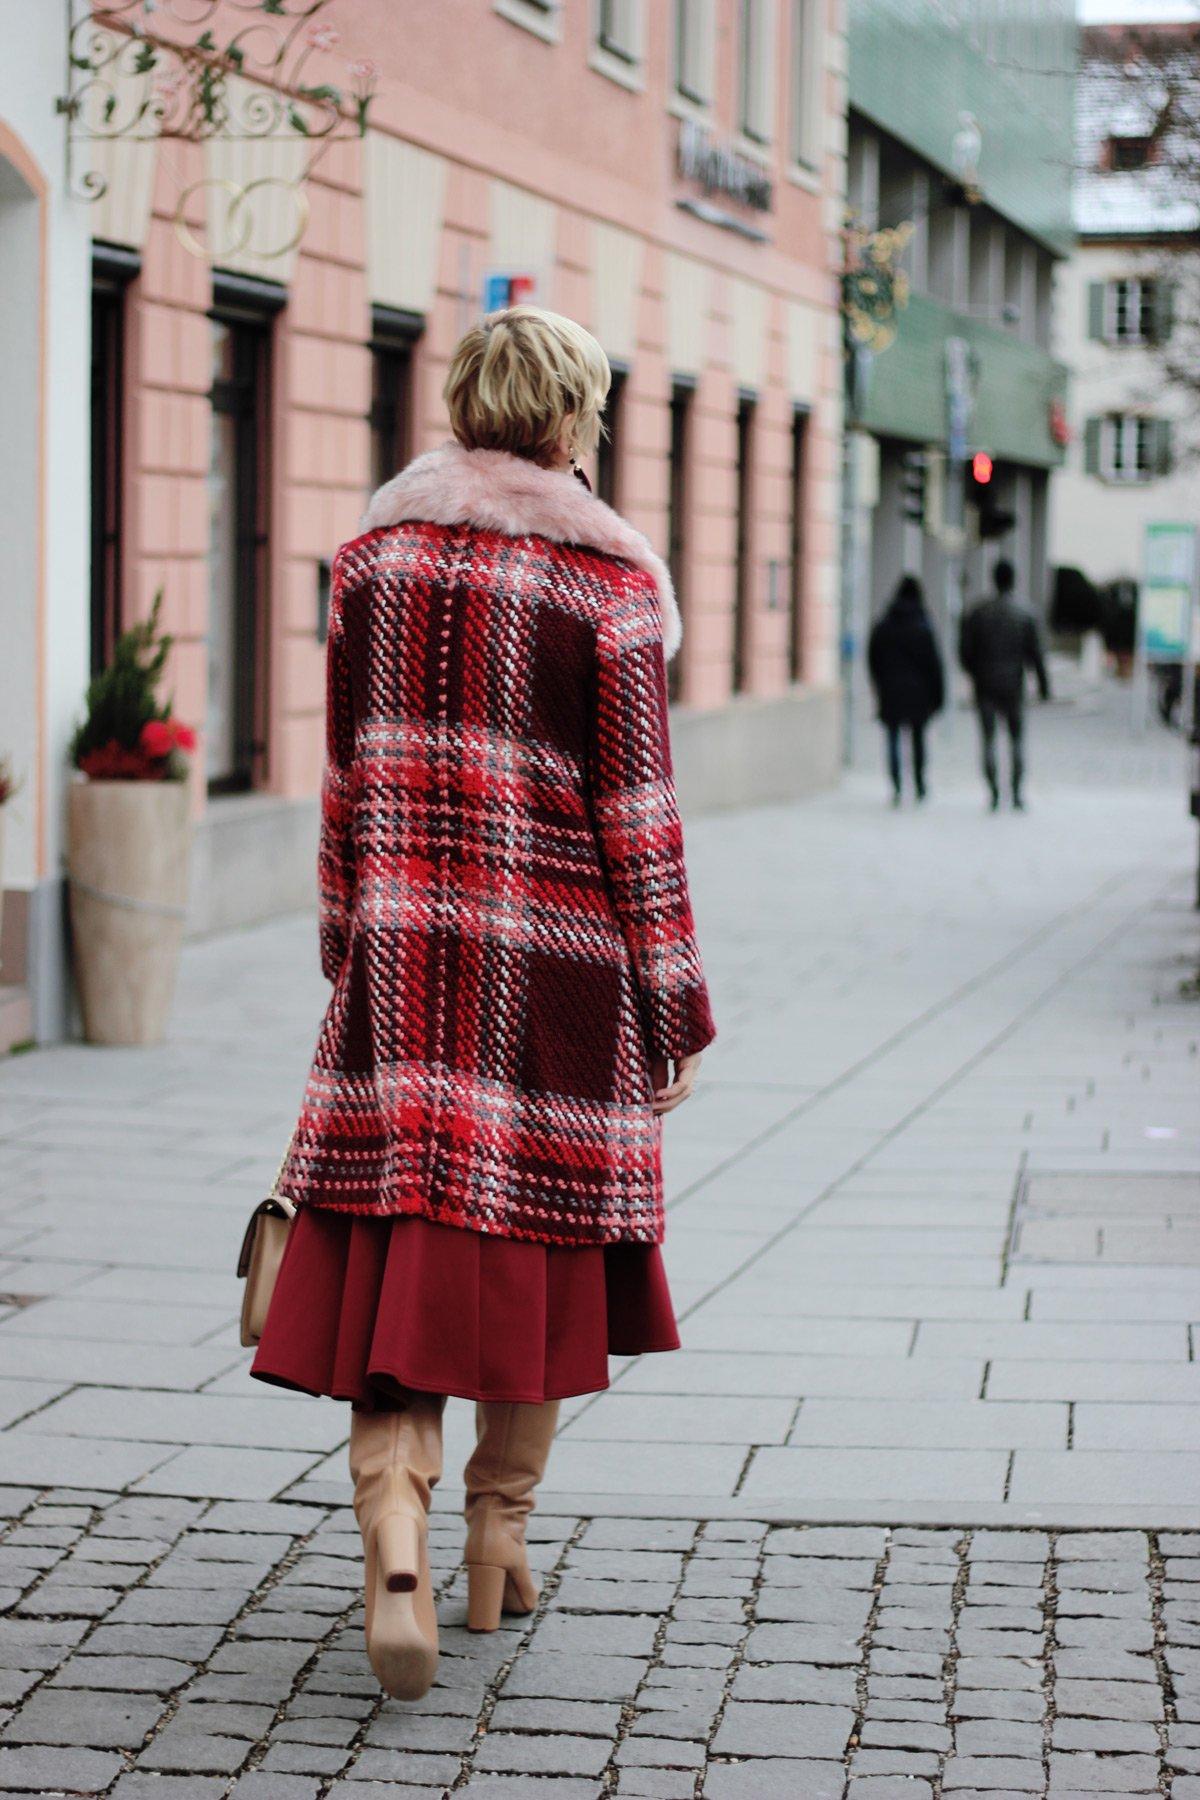 conny doll lifestyle: Tellerrock mit Stiefeln kombiniert, Sinnkrise, Shopping, Weihnachten, Wahnsinn